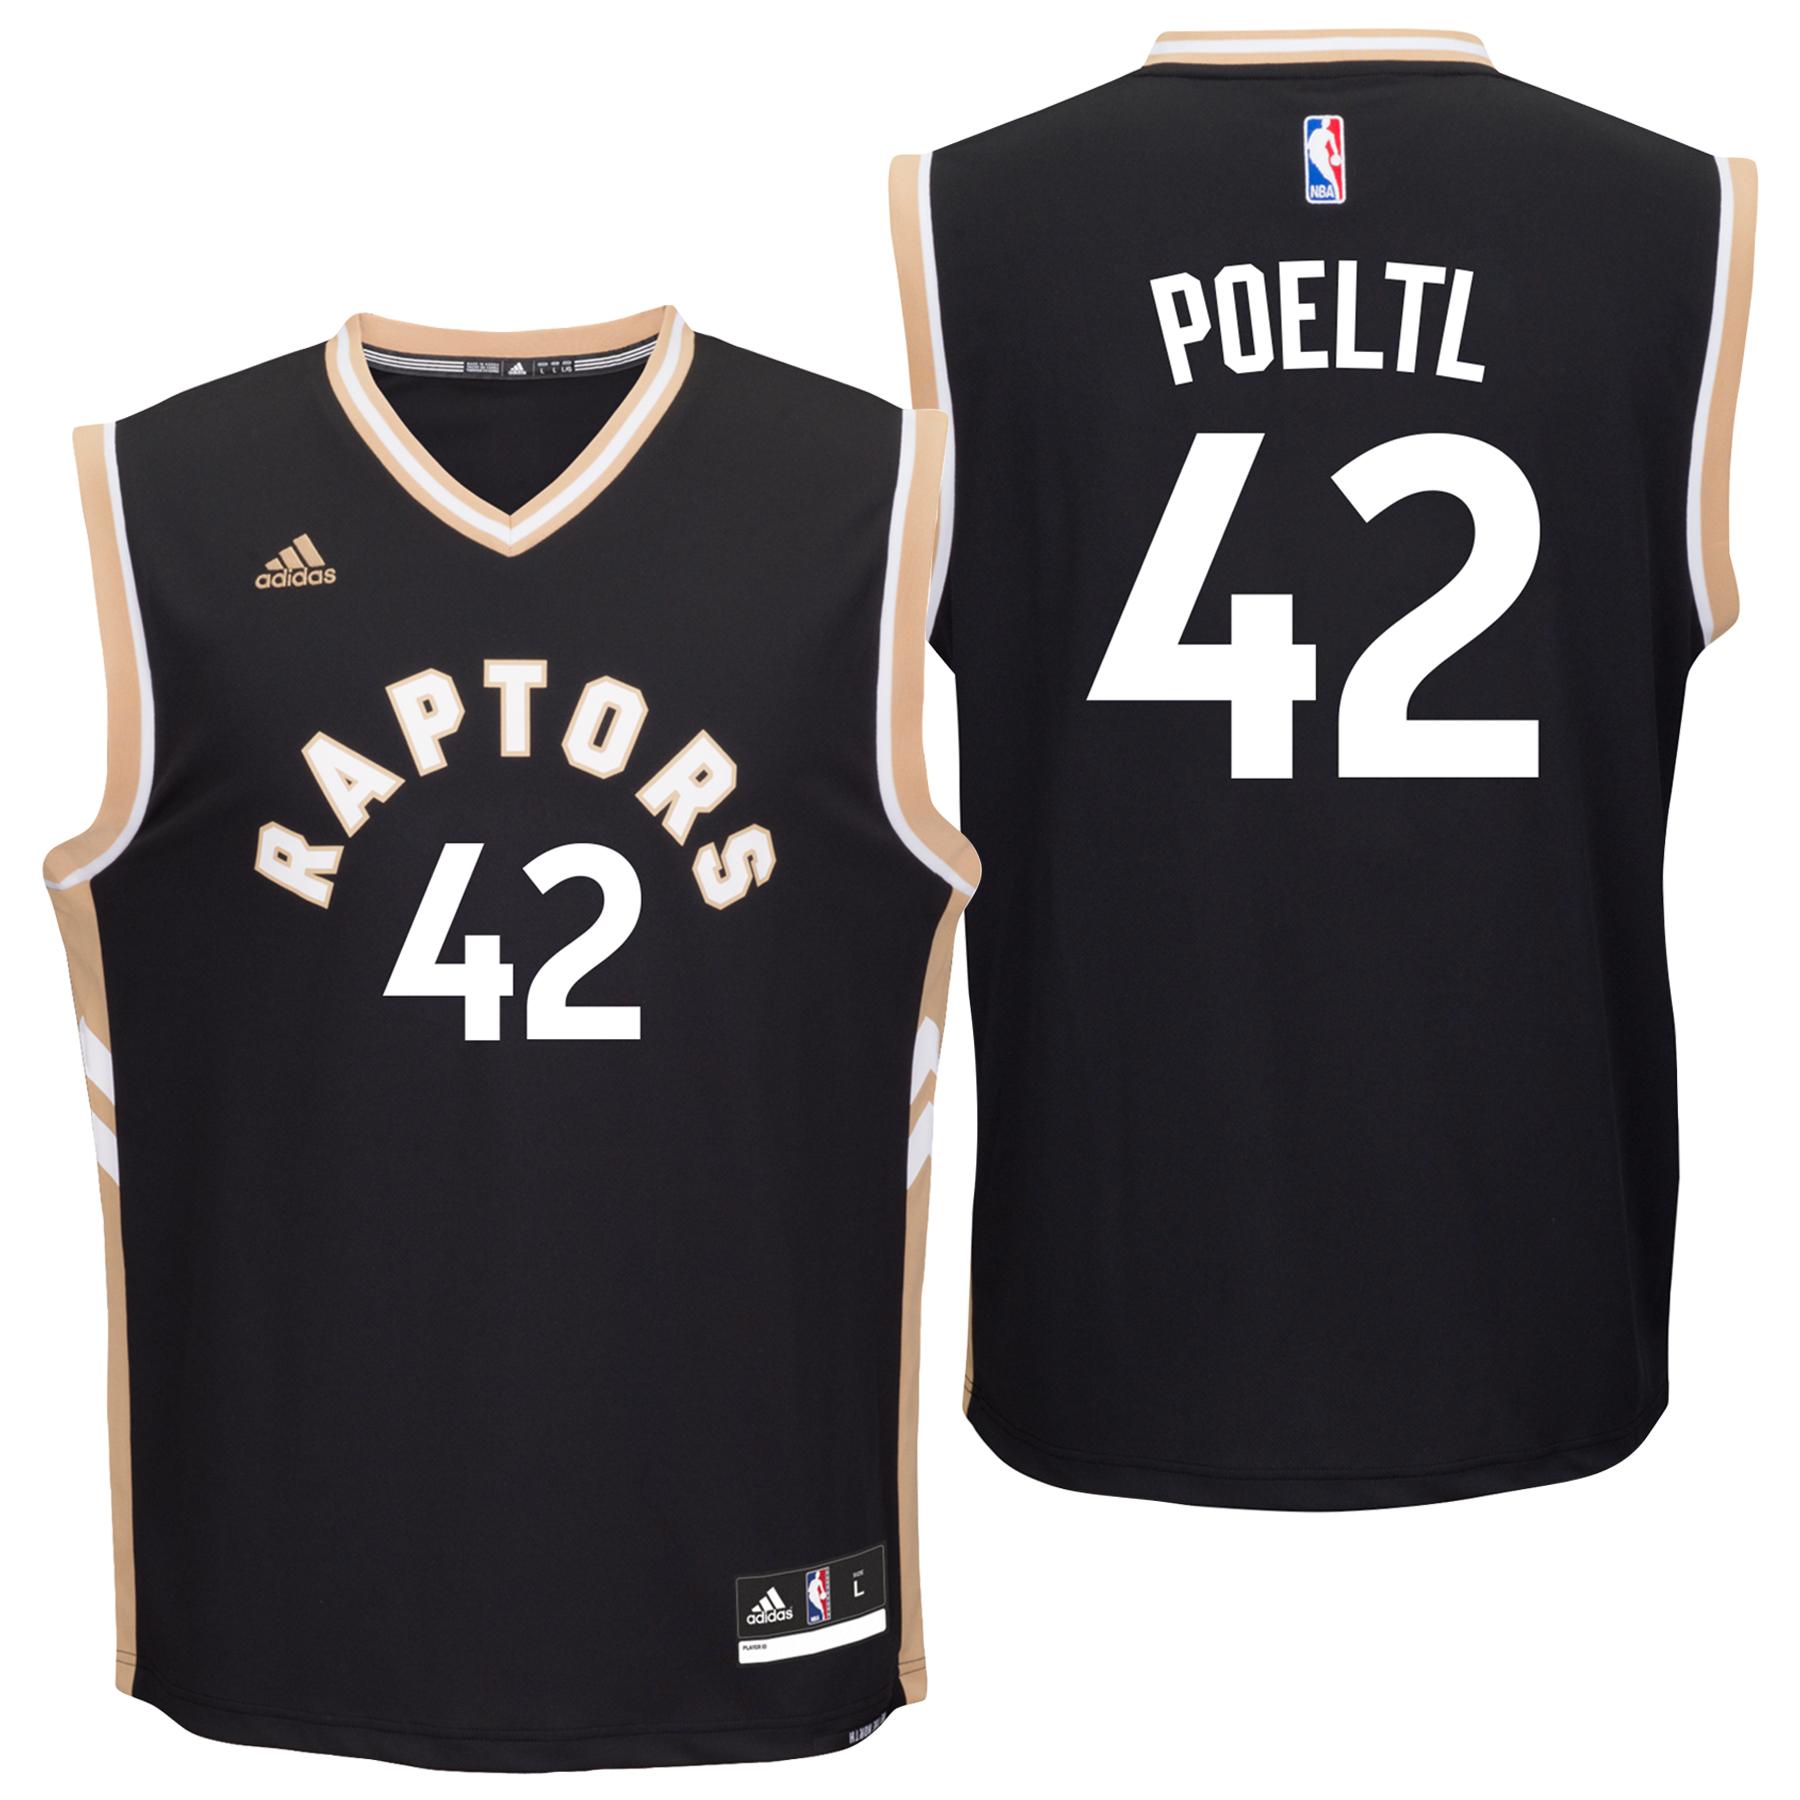 Toronto Raptors Alternate Replica Jersey - Jakob Poeltl - Mens - 1st R